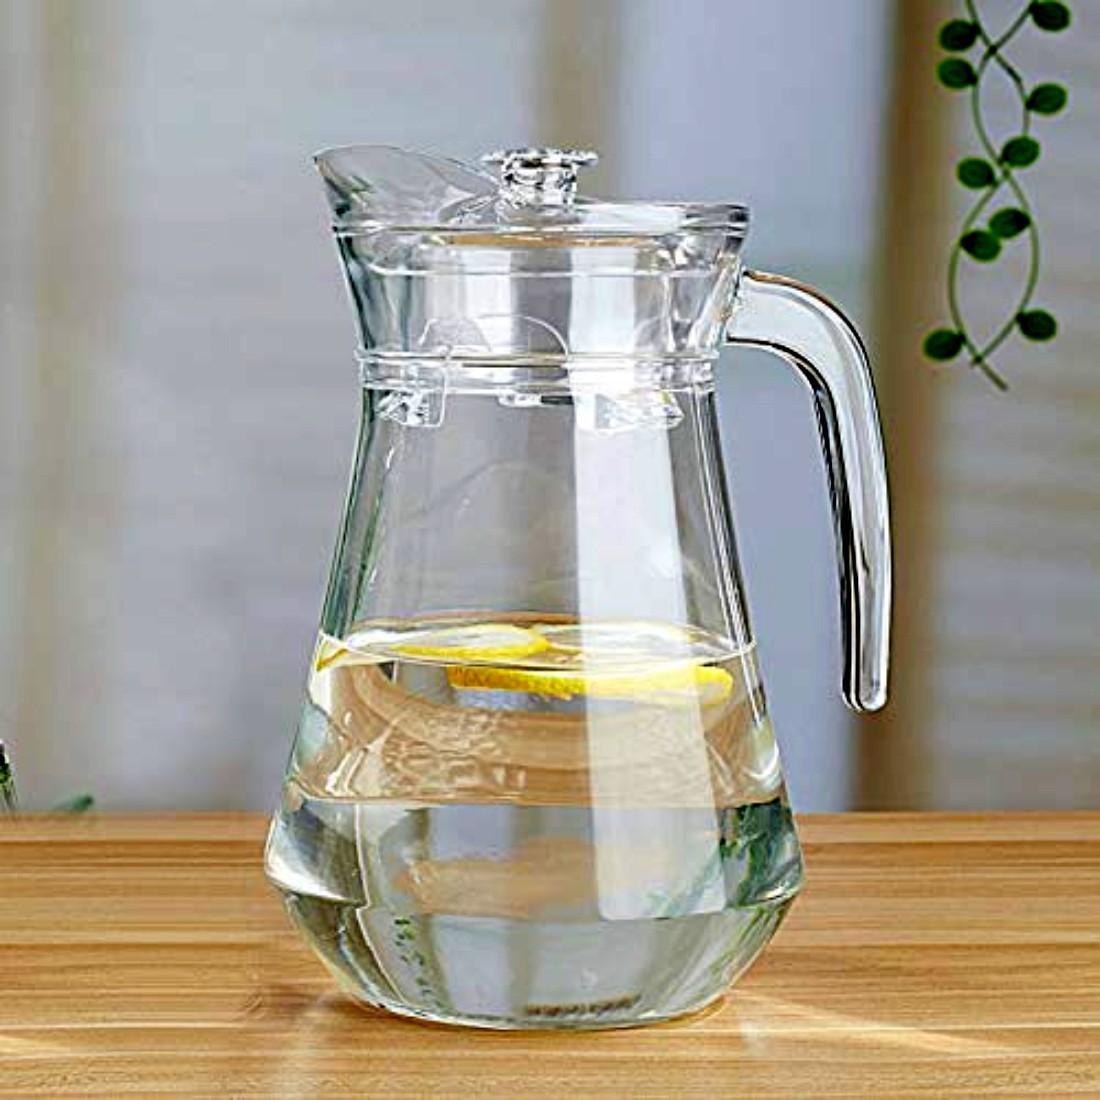 Imported New Design Transparent Water Jug 1.1L